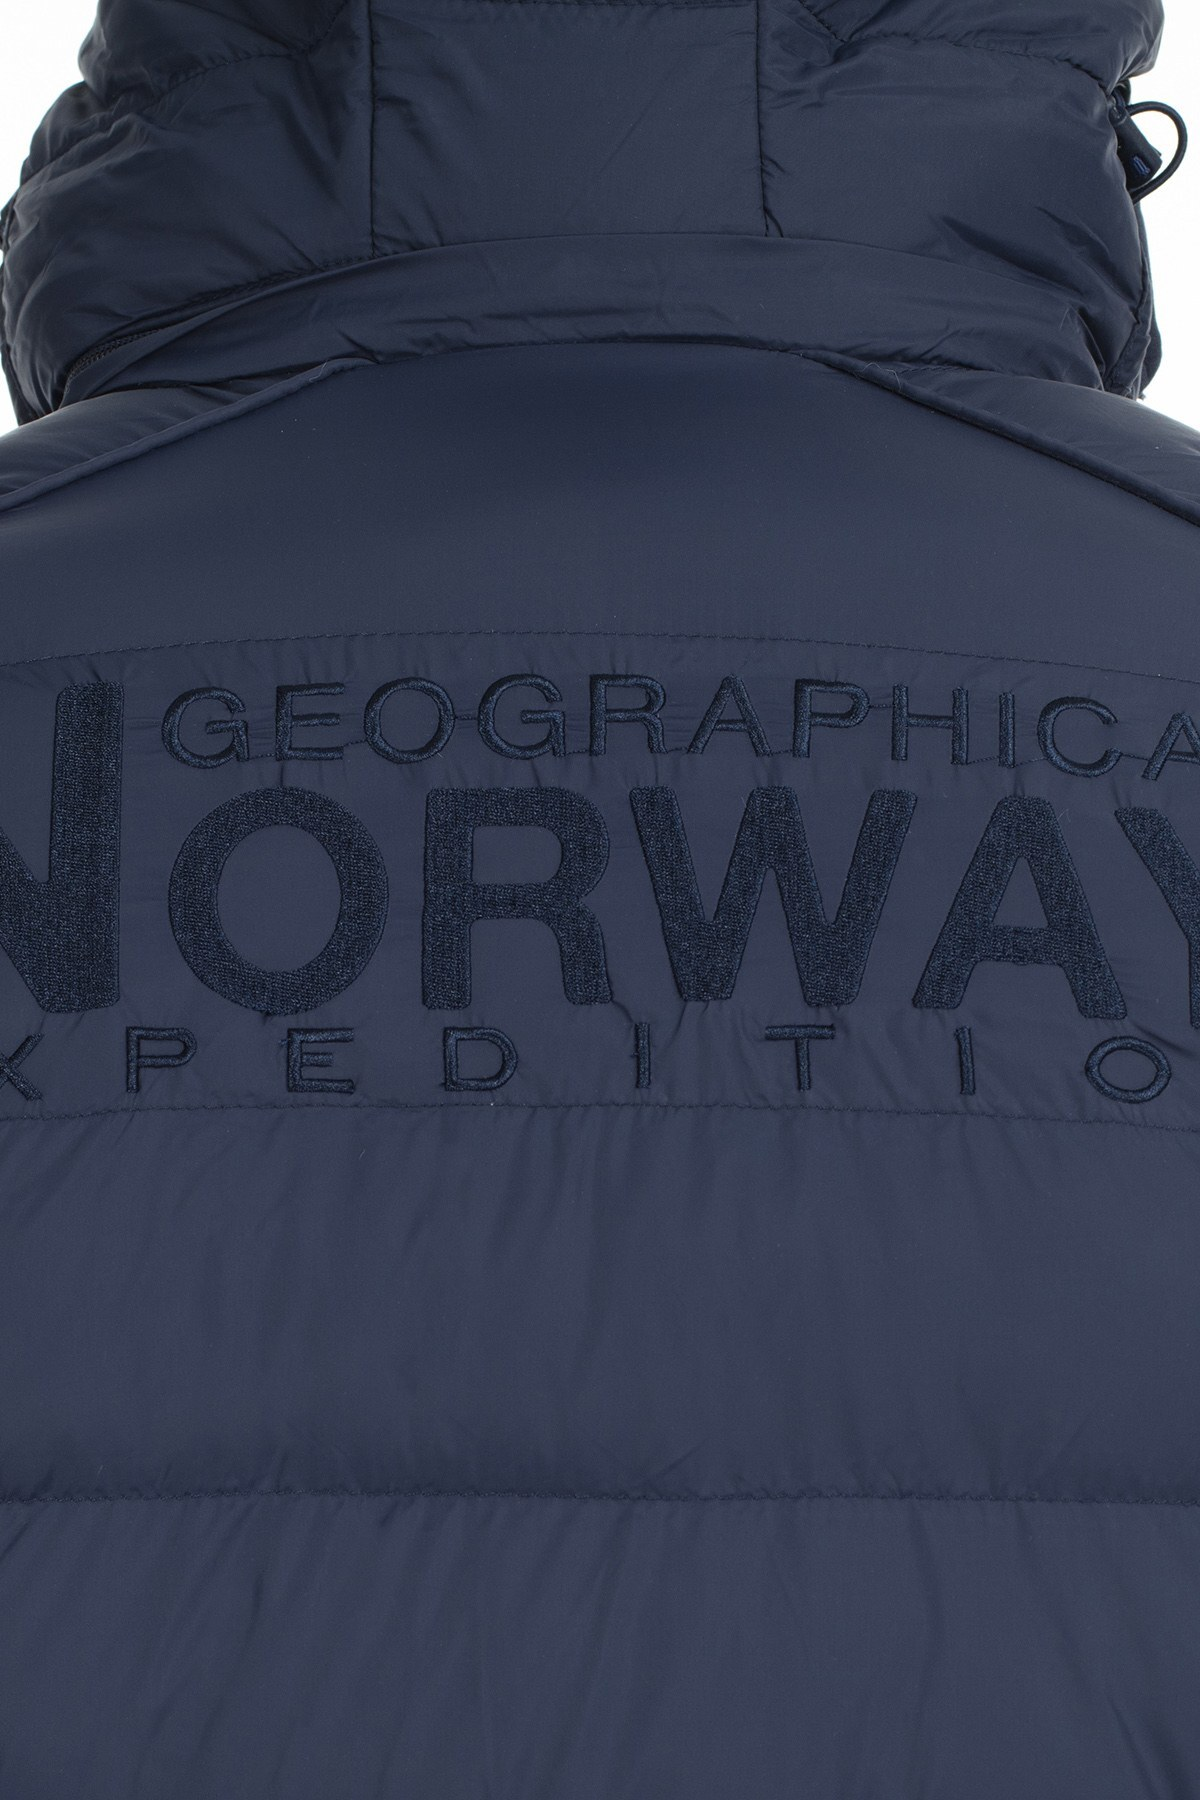 Norway Geographical Outdoor Erkek Parka BOMBE LACİVERT